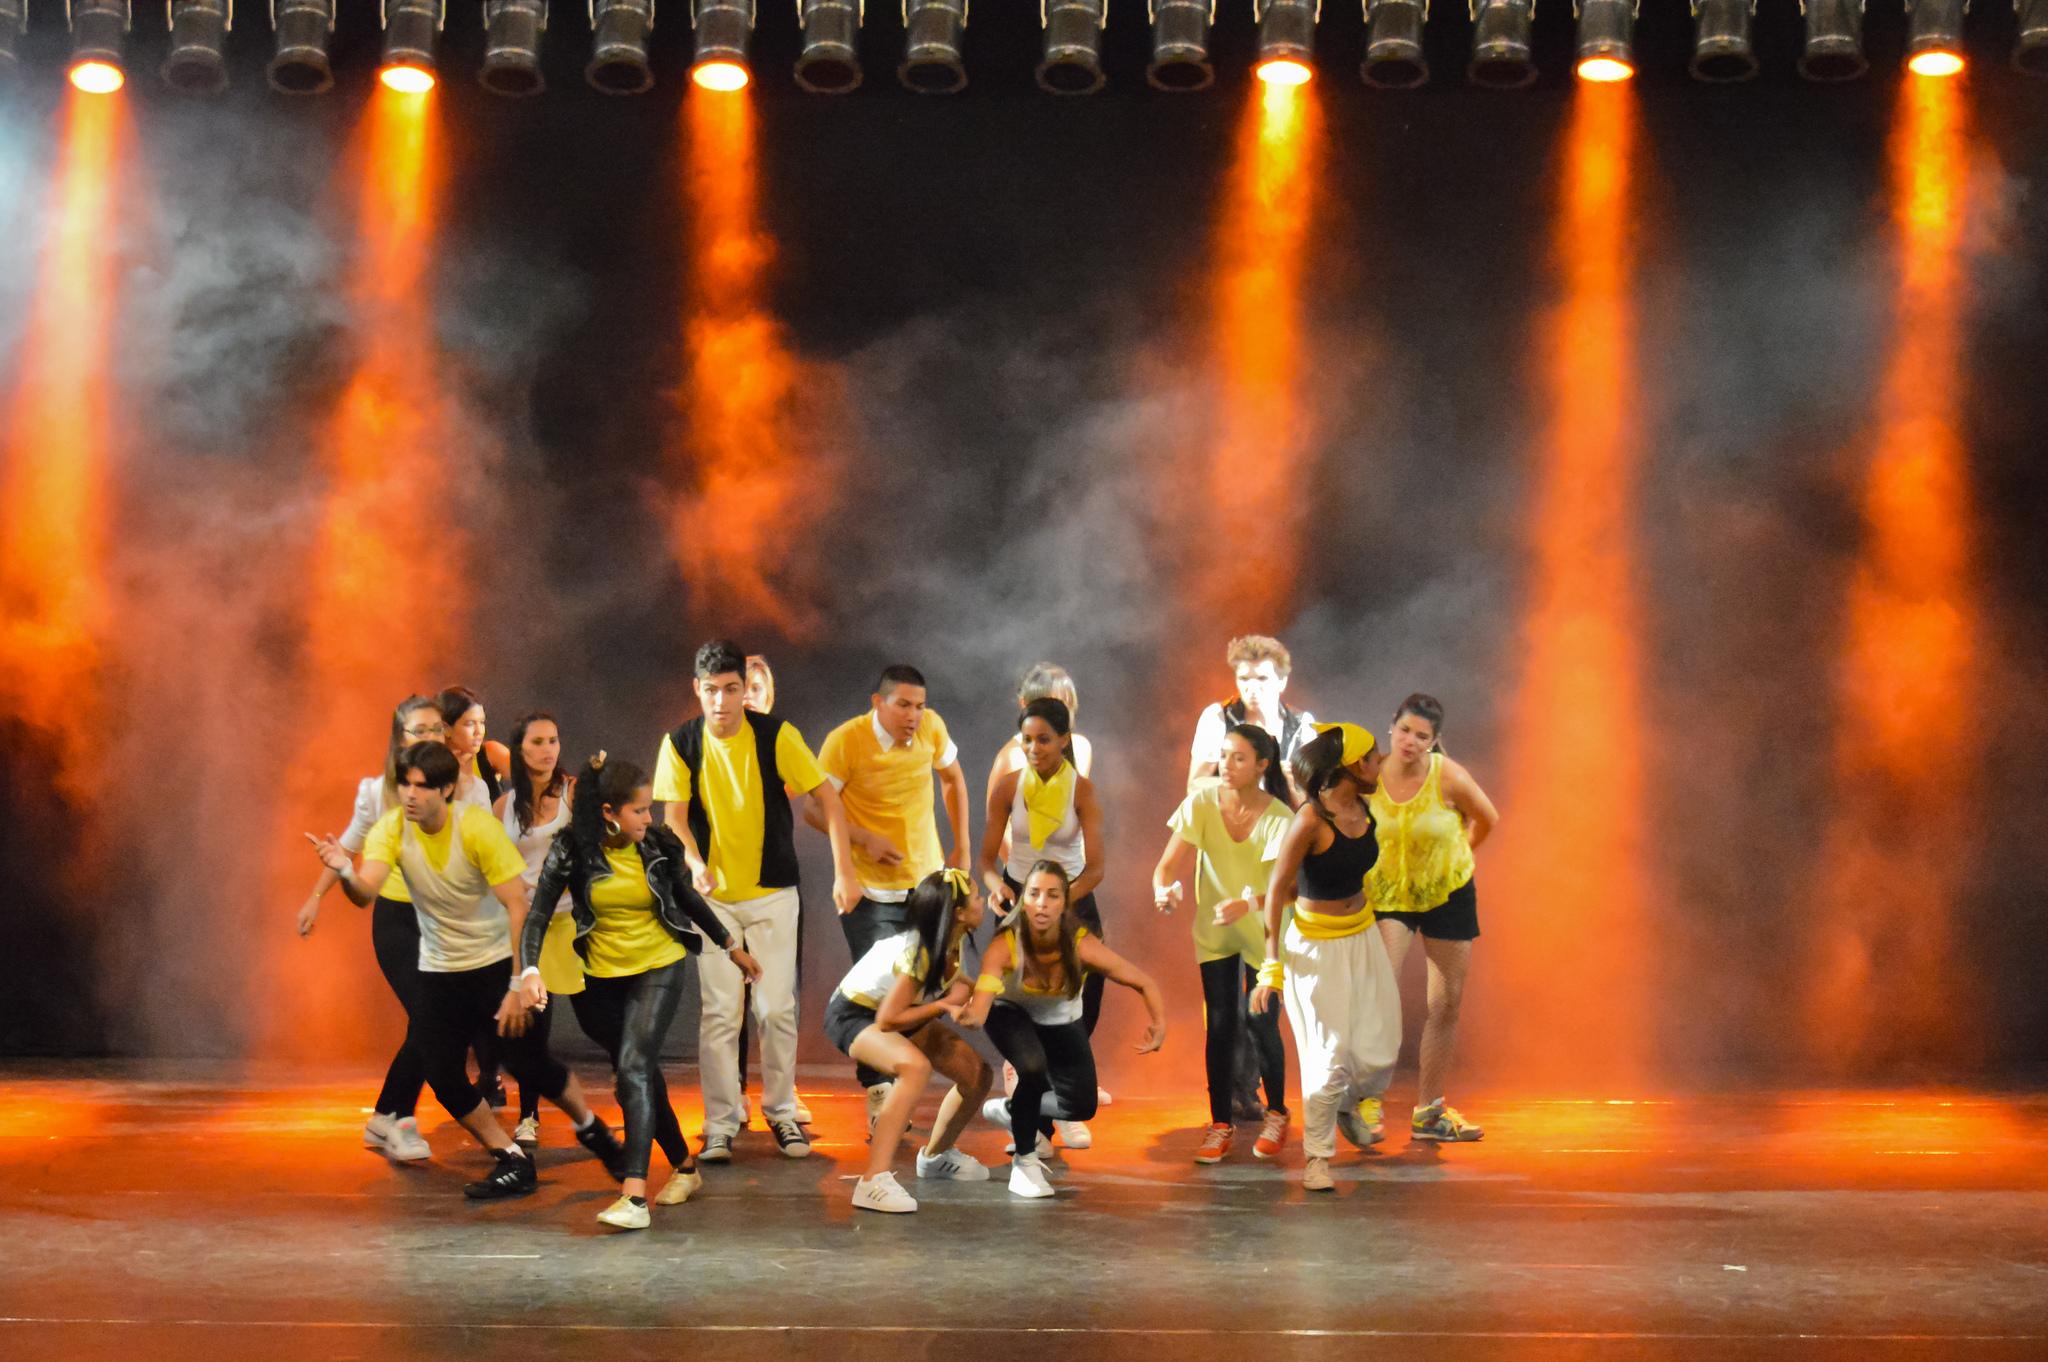 Say You Wont Let Go  James Arthur  May J Lee amp Bongyoung Park Choreography